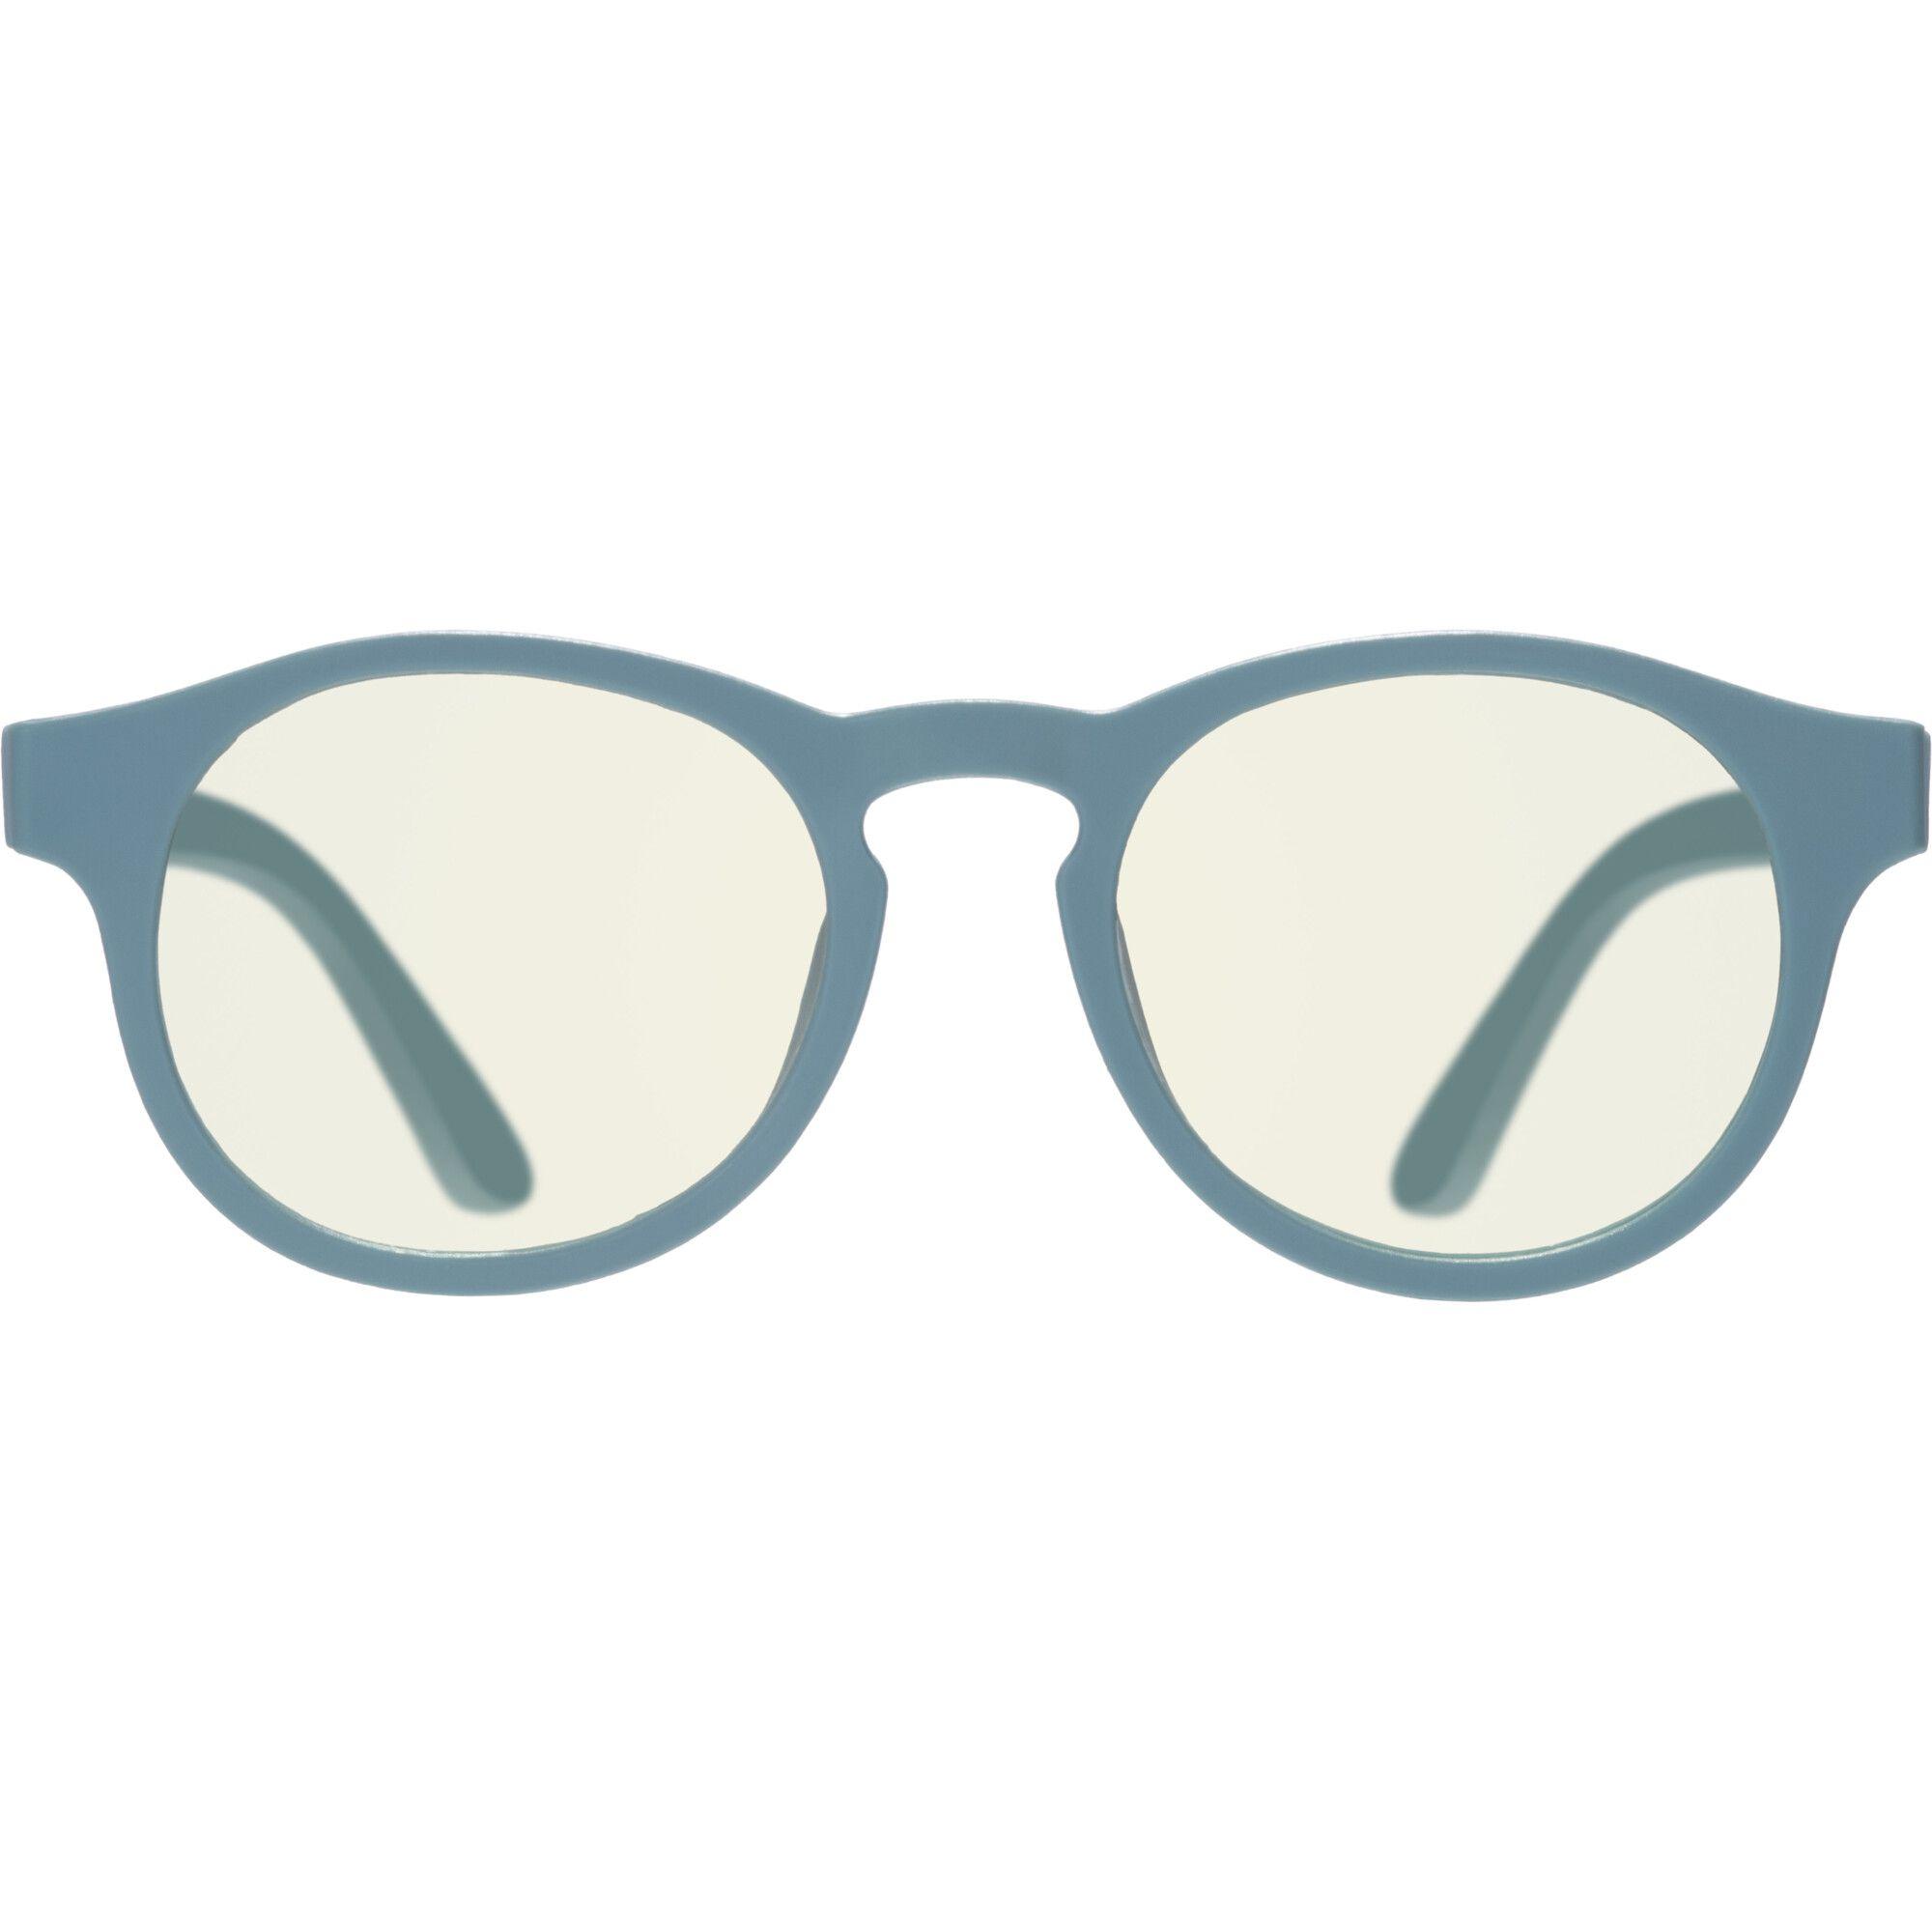 Babiators Blue Light Blocking Children's Glasses